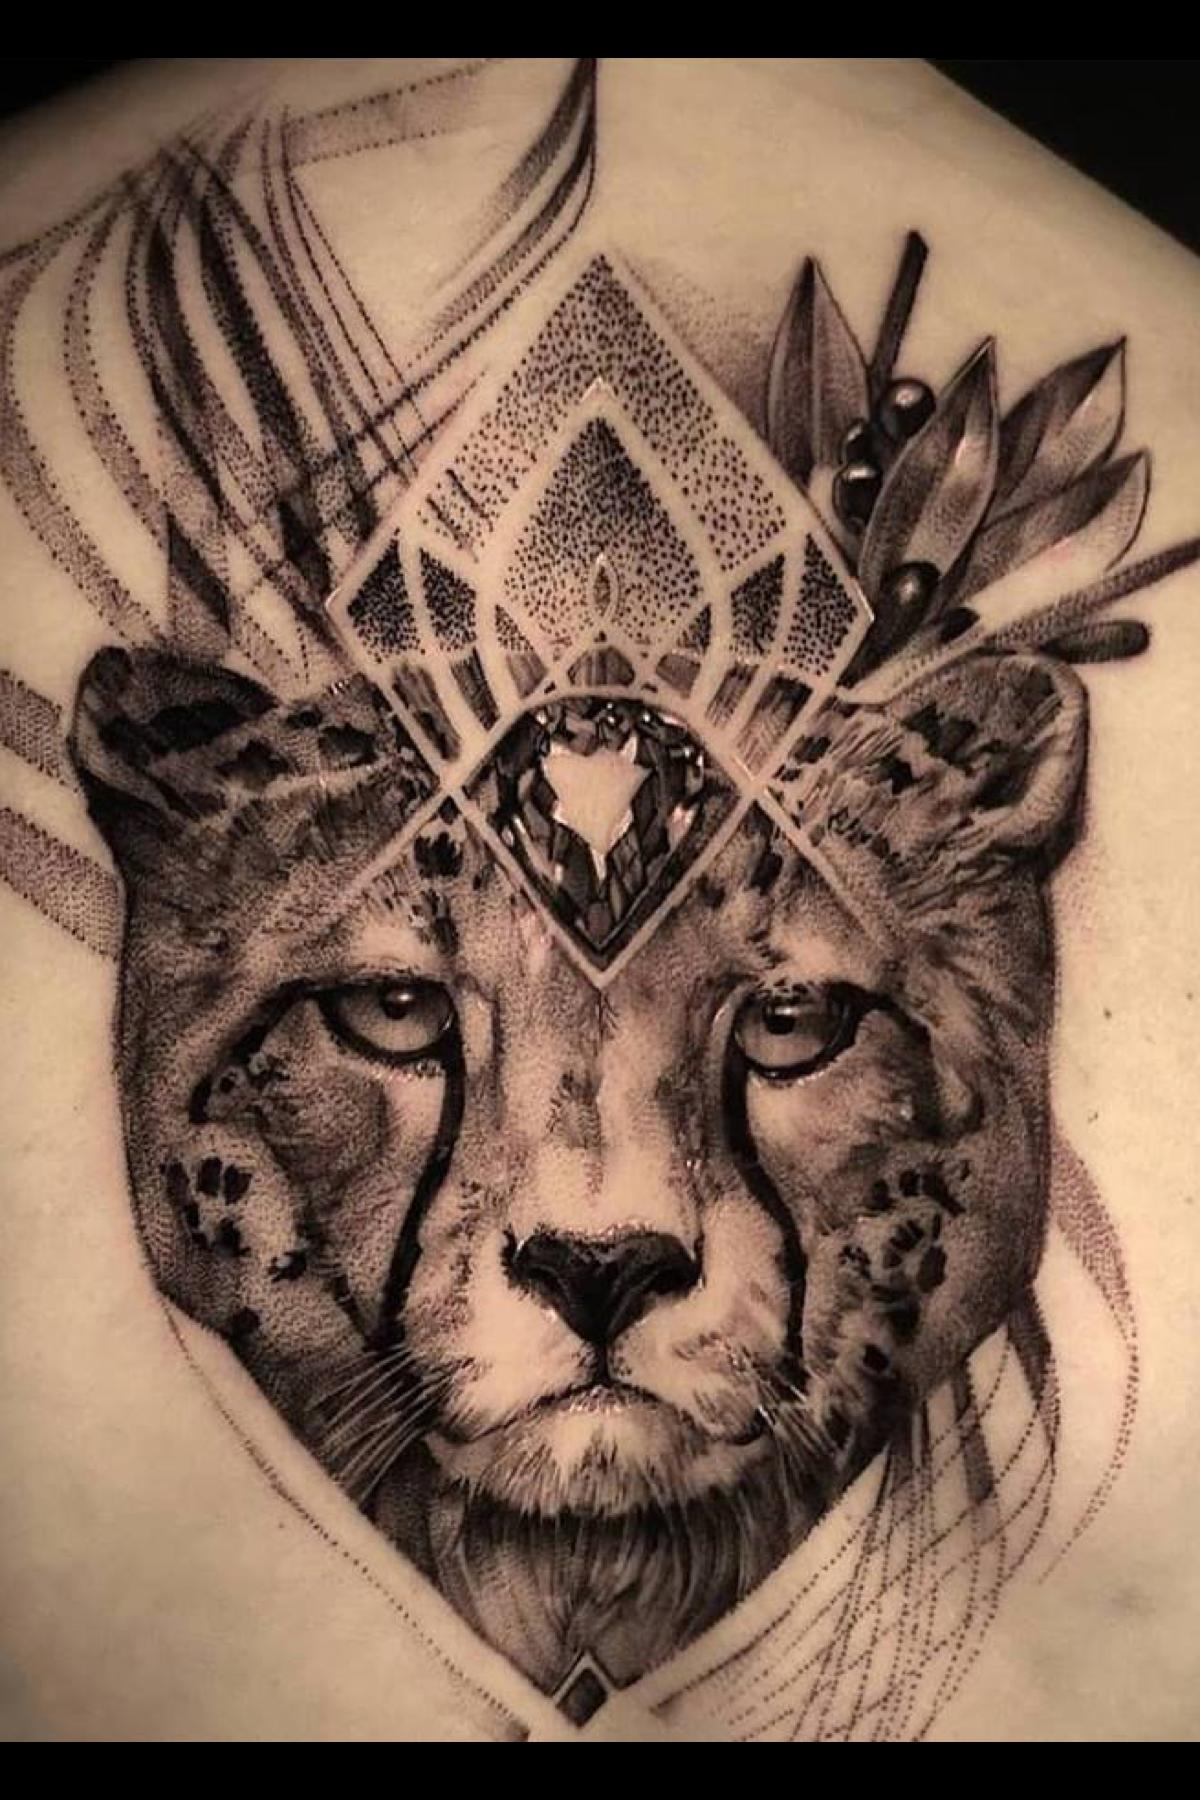 Black And Grey Big Cats Tattoo Realistic Cheetah Tattoo For Men